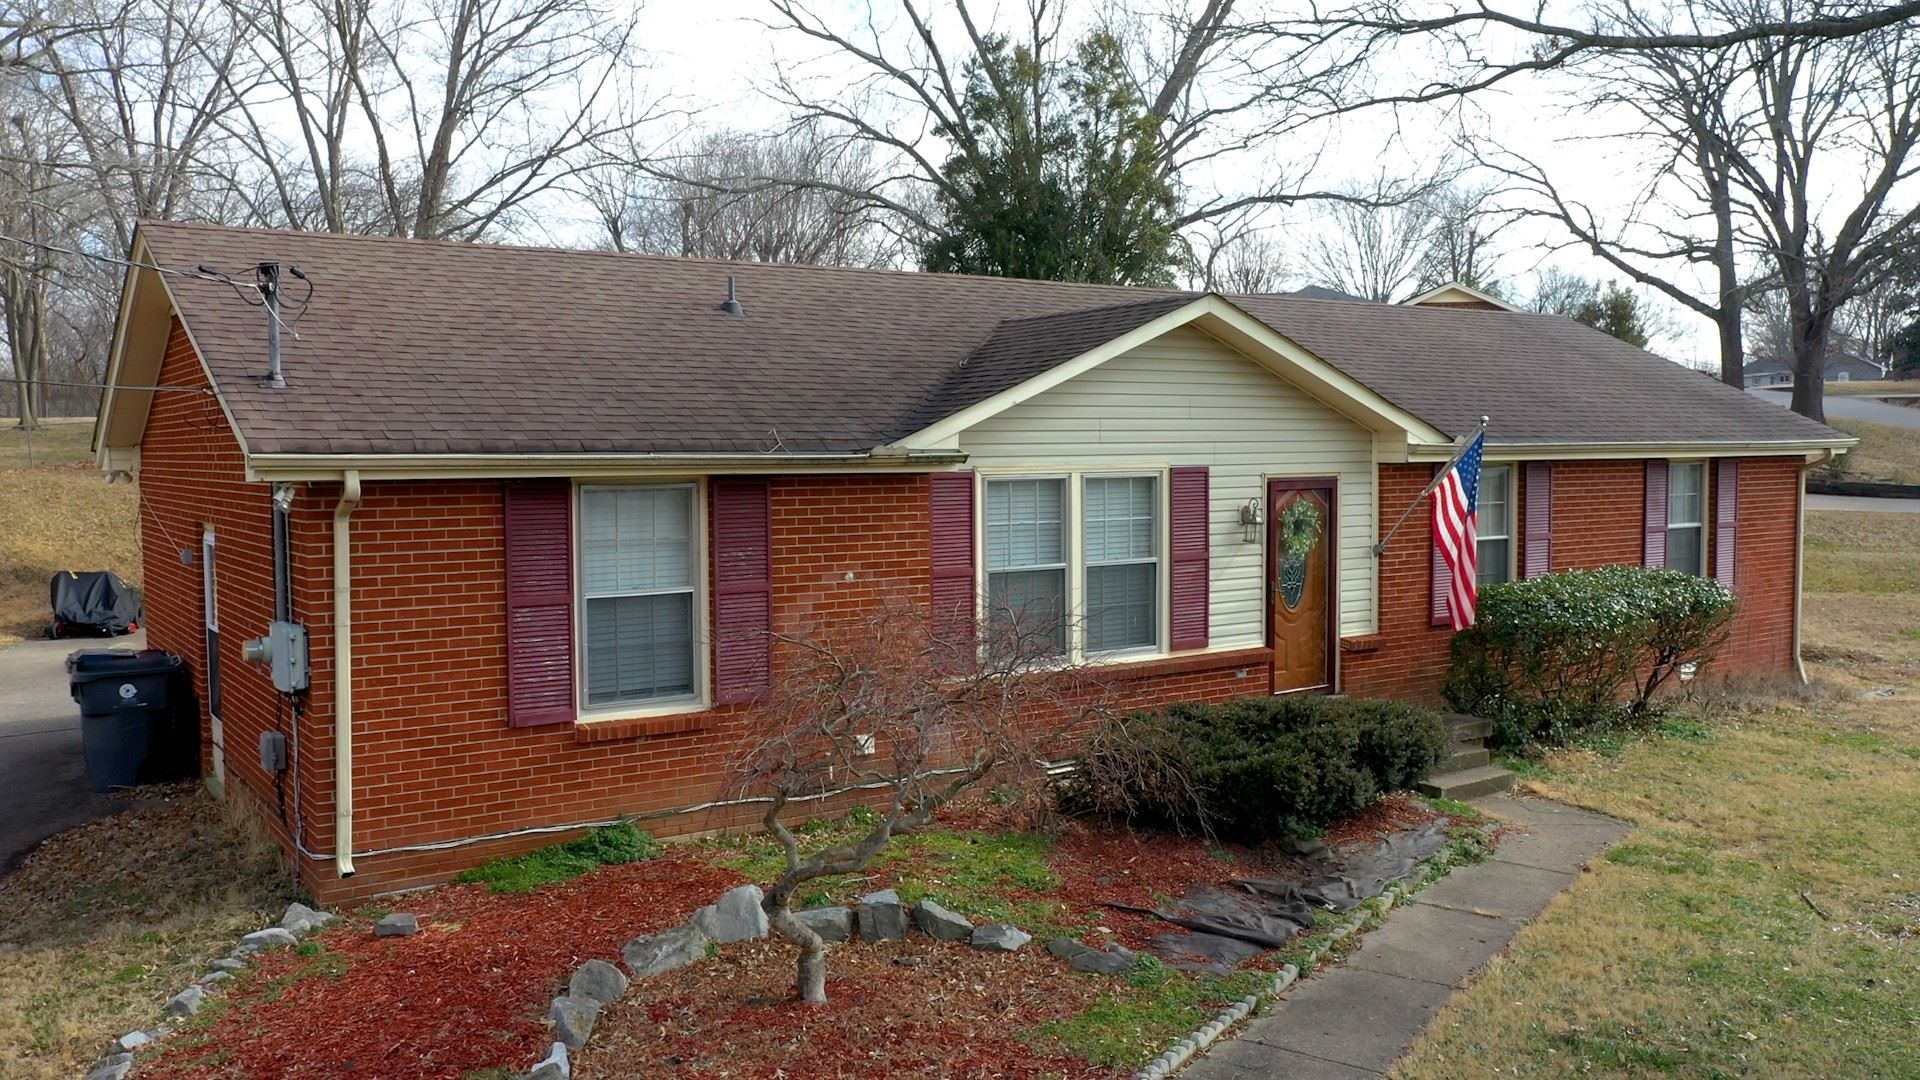 1873 Harriet Dr, Clarksville, TN 37040 - MLS#: 2260842